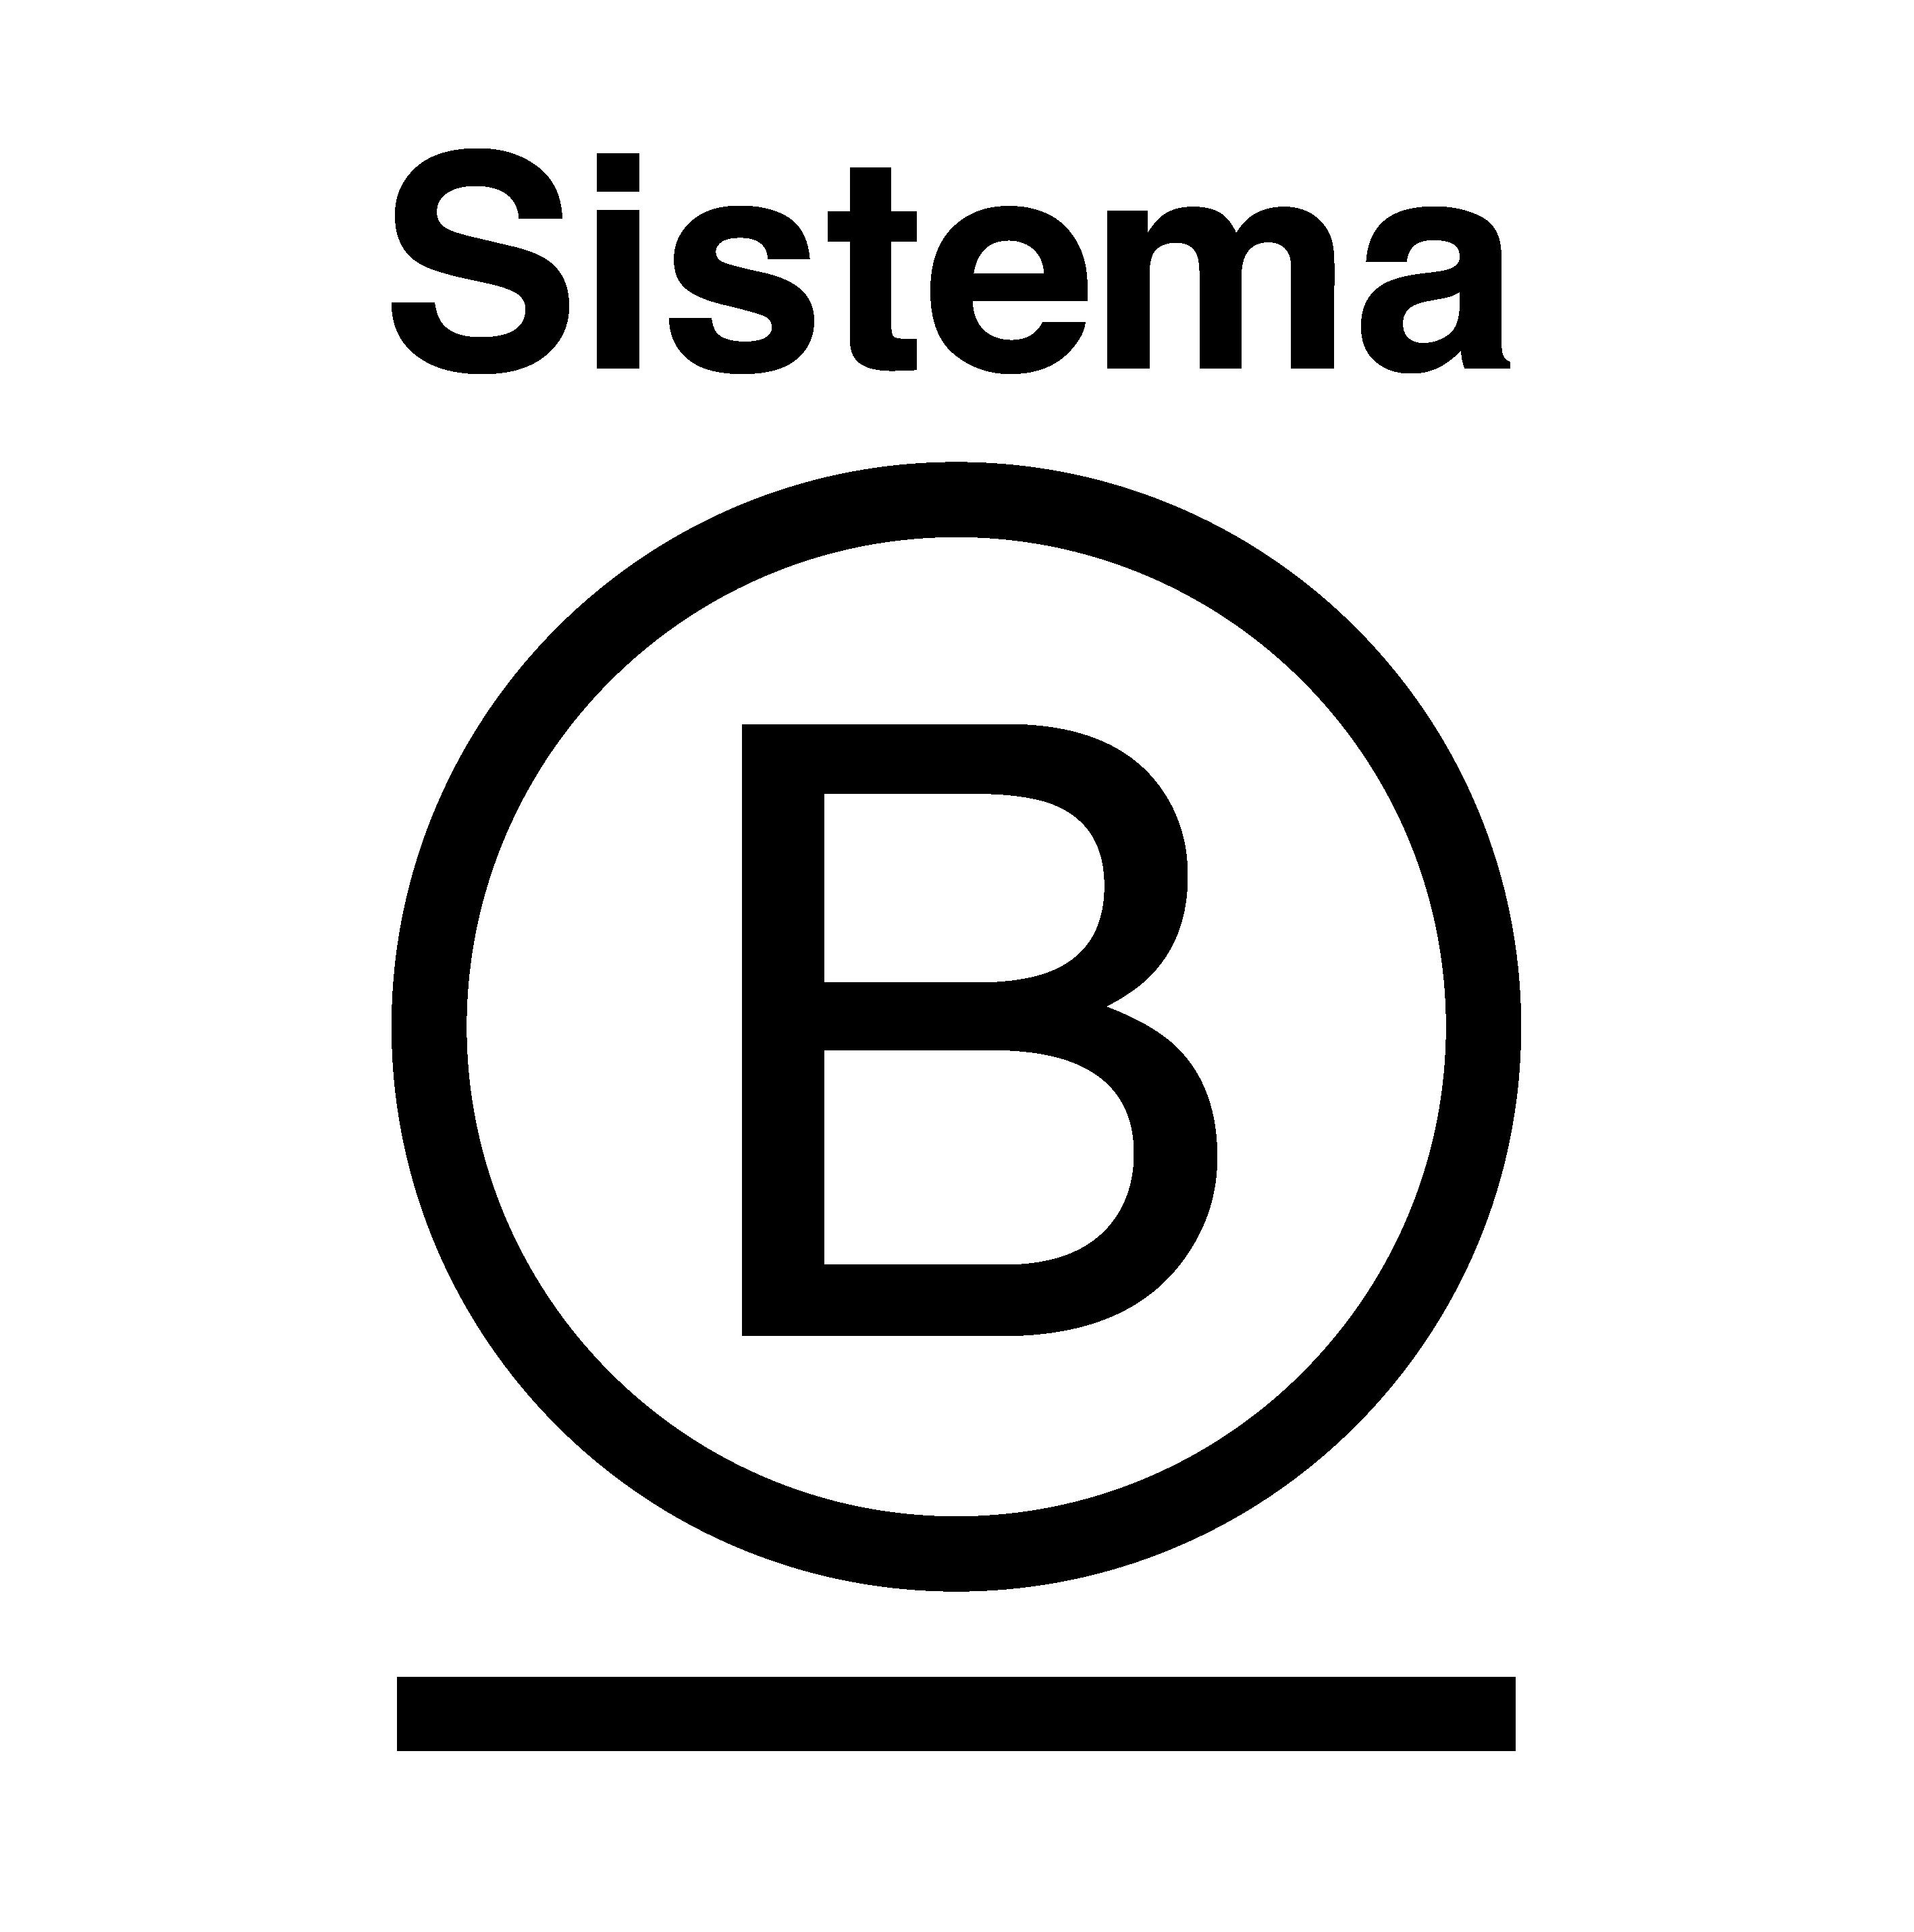 Sistema B Chile